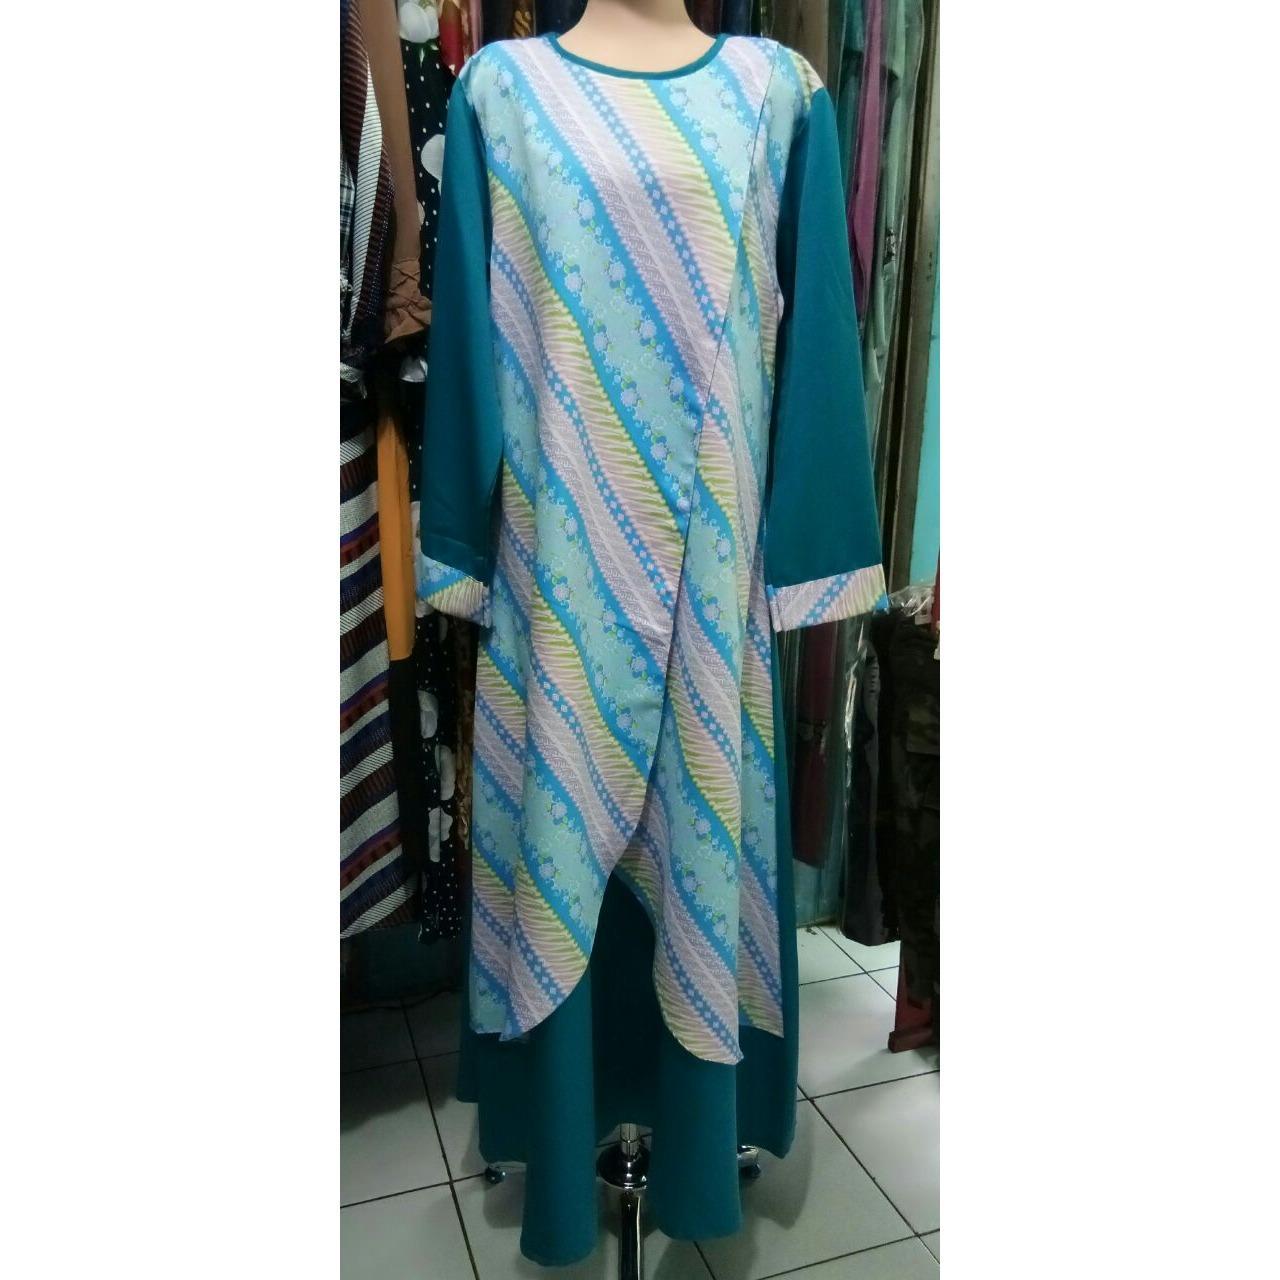 Gamis Cantik Abaya Batik Dengan Bahan Batik Dan Baloteli